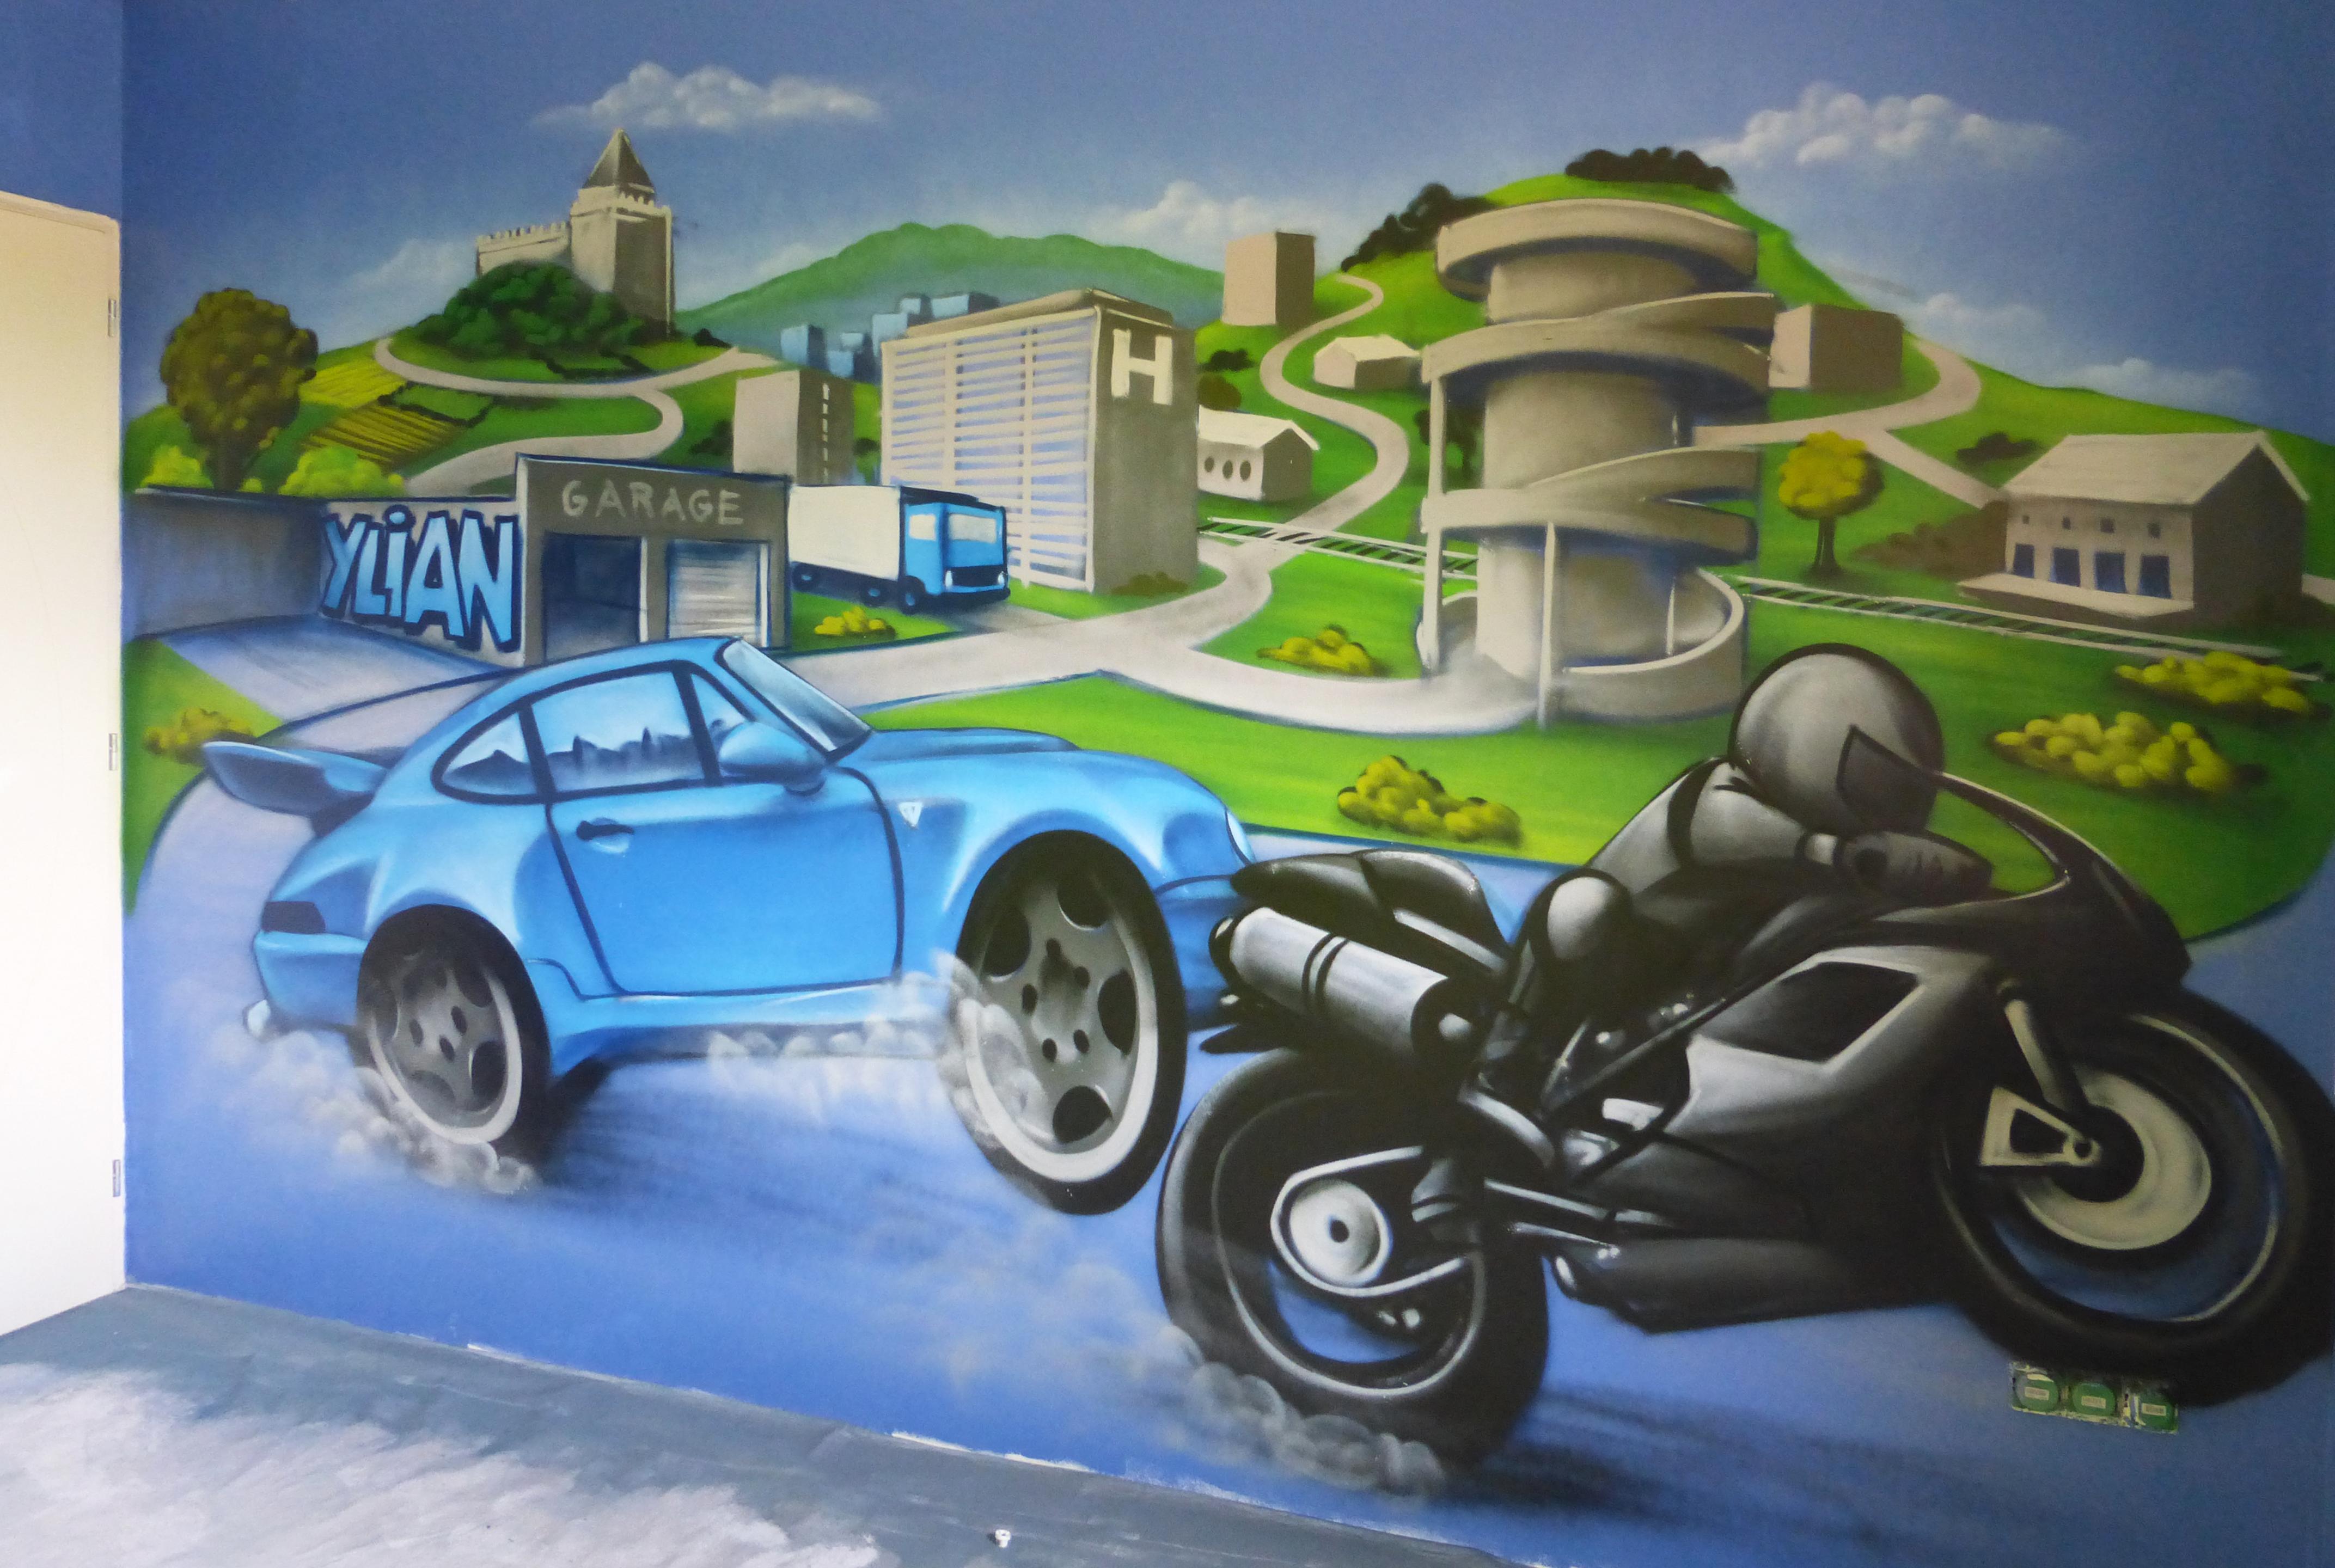 Decom Deco Graff Deco Chambre Enfant Moto Voiture